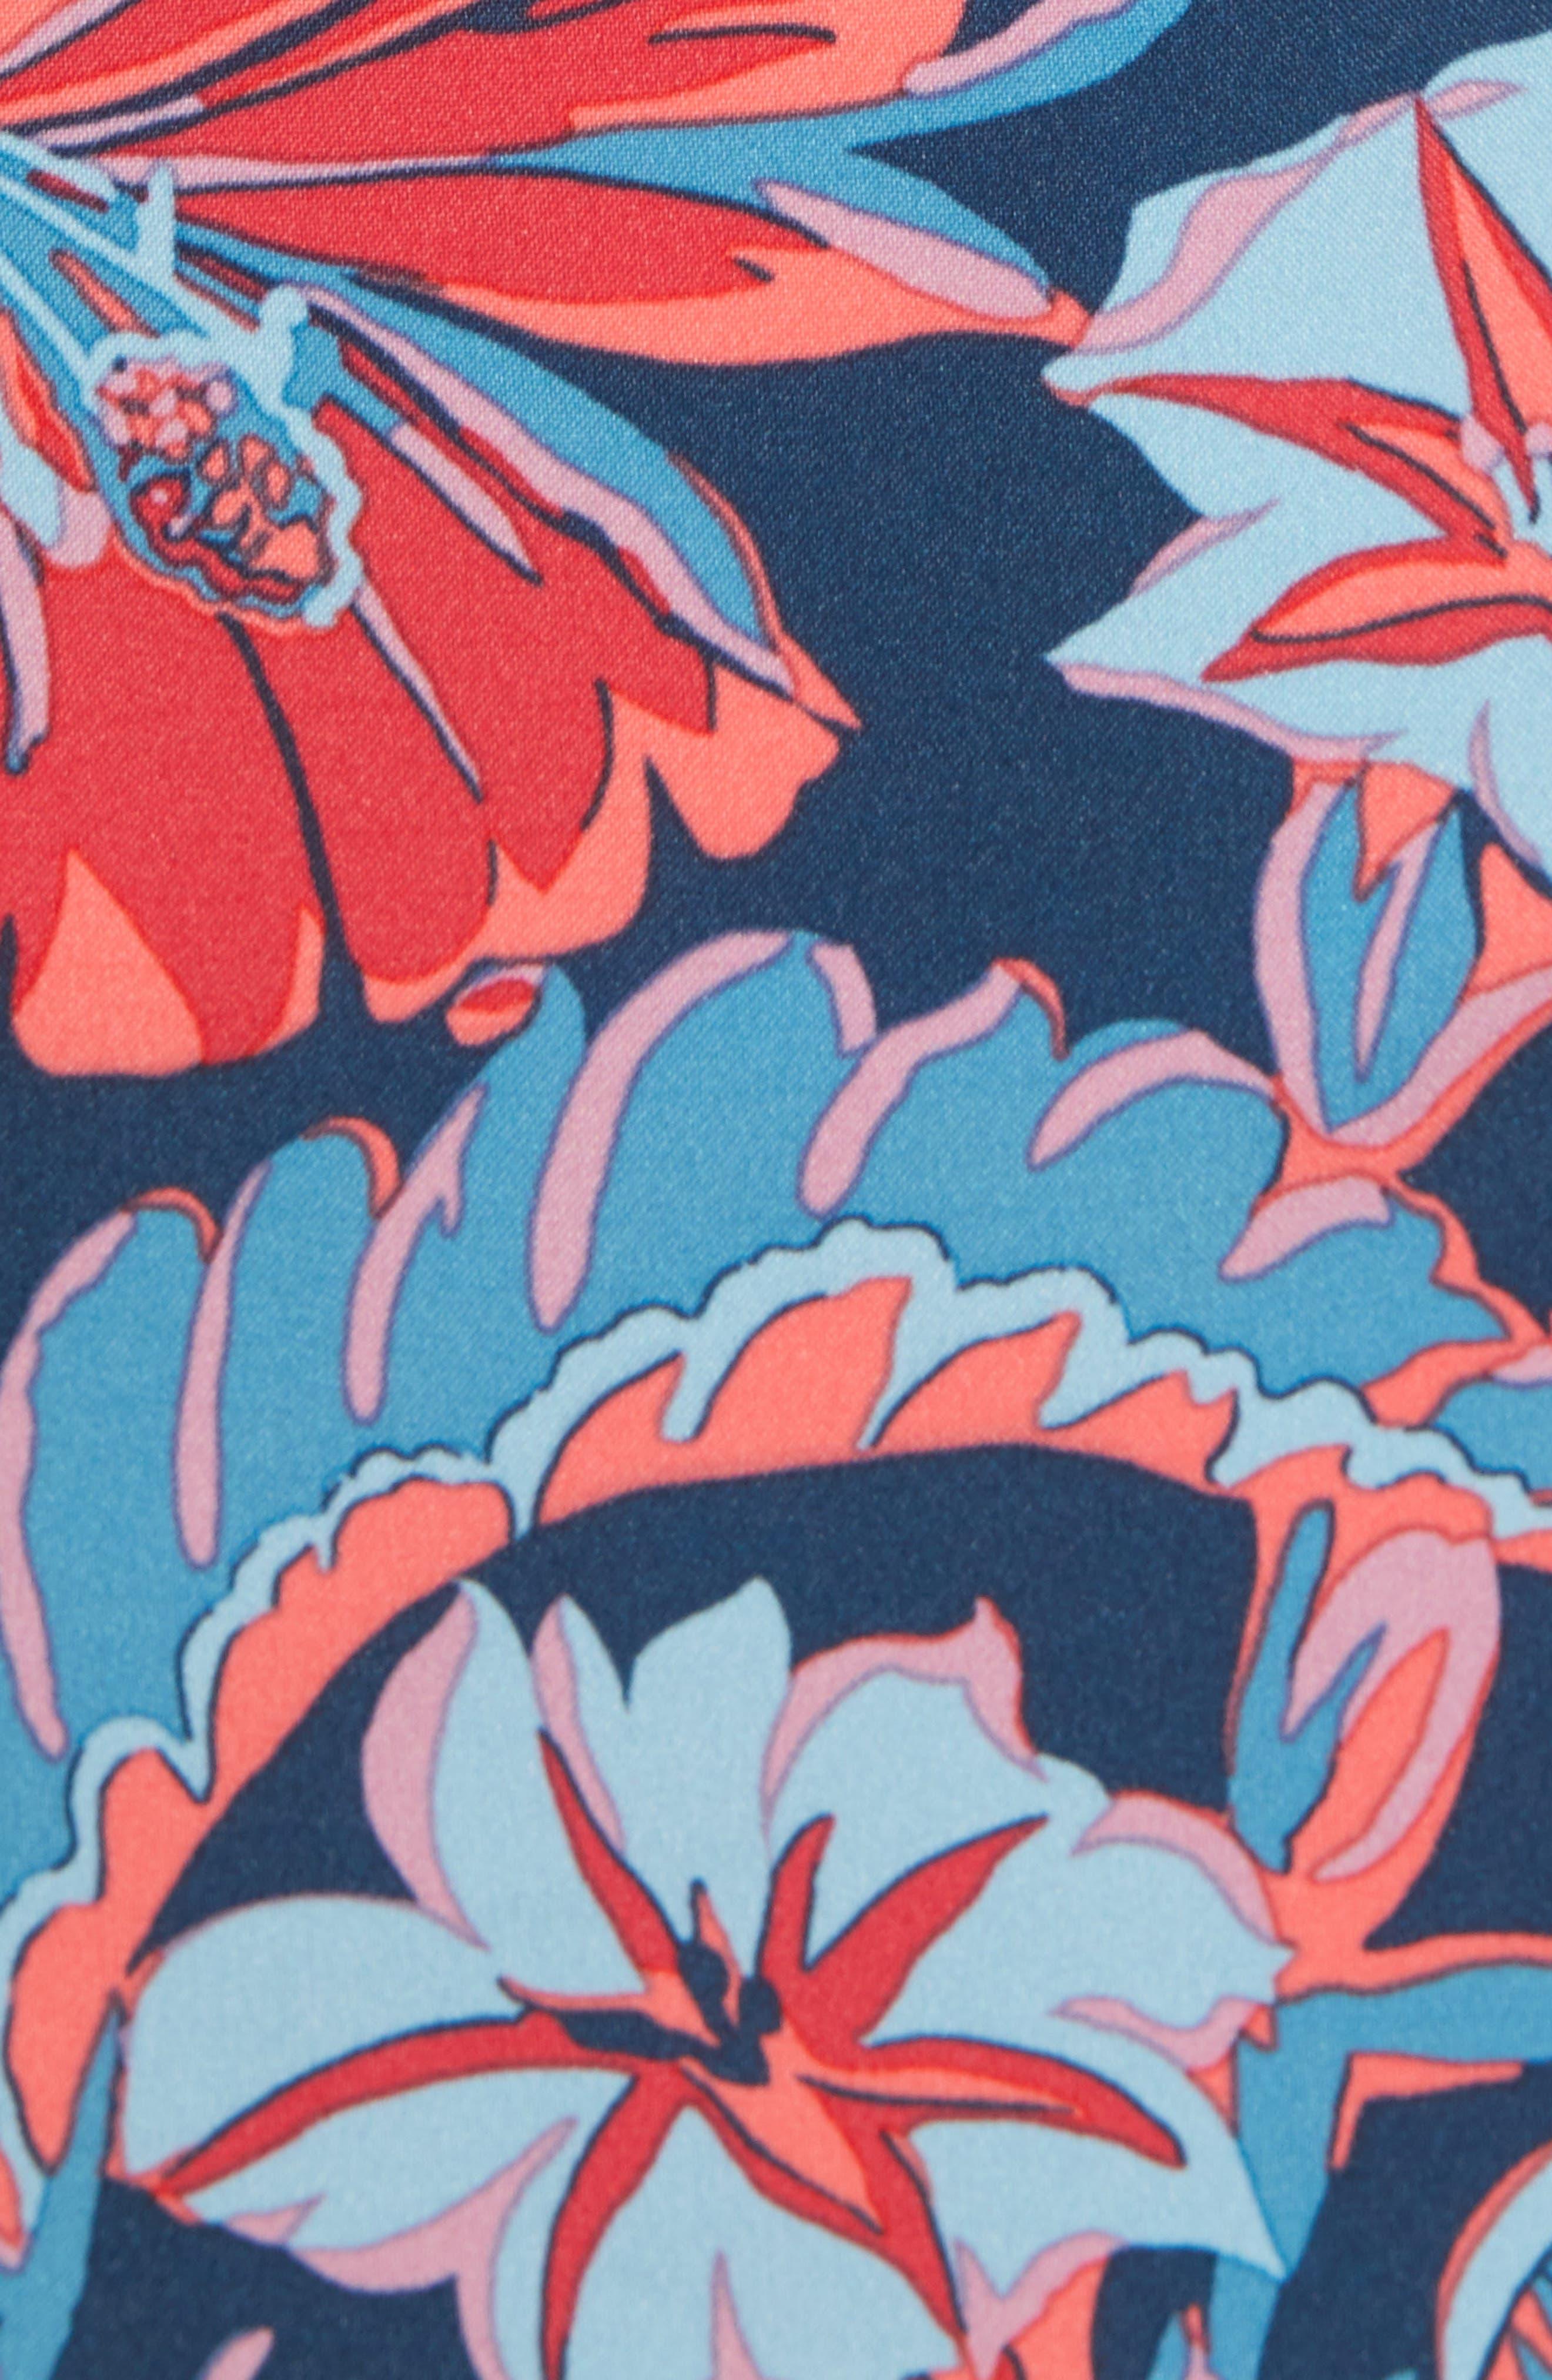 Banzai 9-Inch Swim Trunks,                             Alternate thumbnail 5, color,